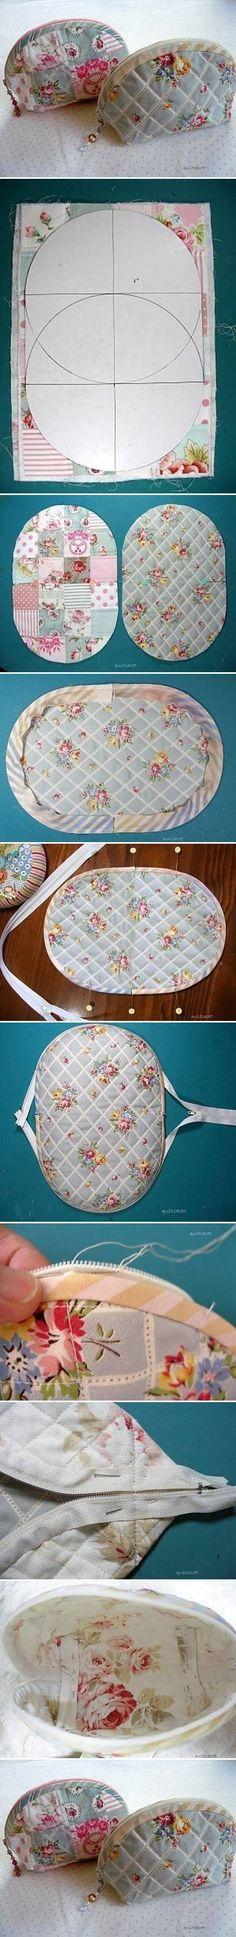 DIY Sew Makeup Bag DIY Projects / UsefulDIY.com